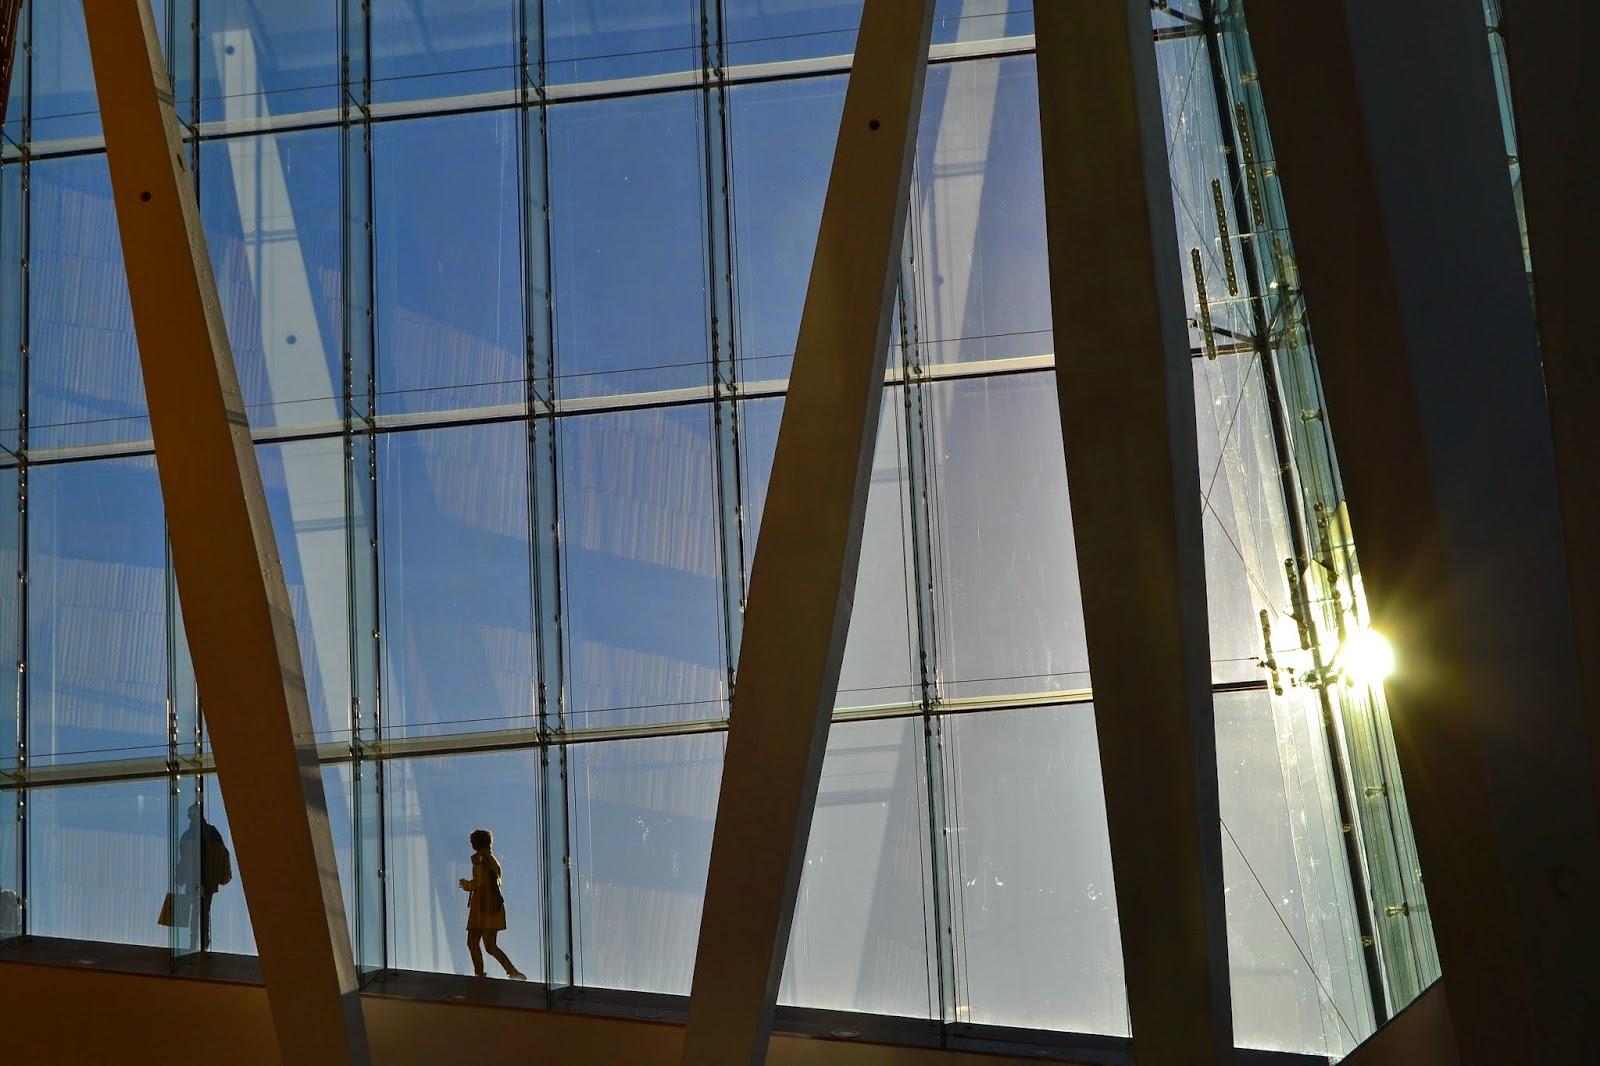 oslo opera house windows